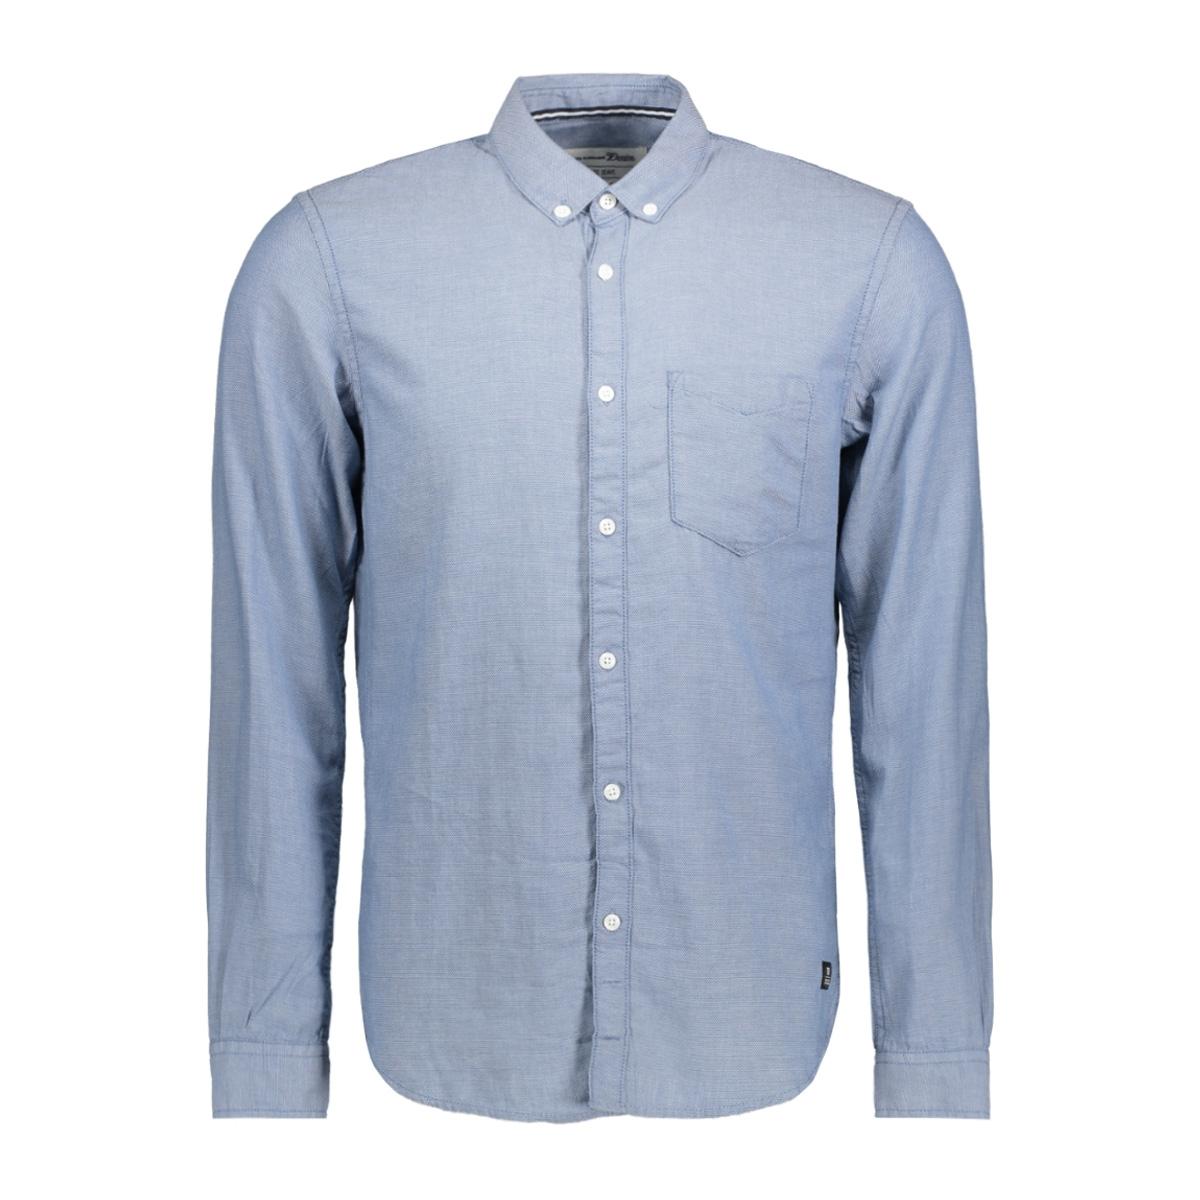 2055106.00.12 tom tailor overhemd 6734